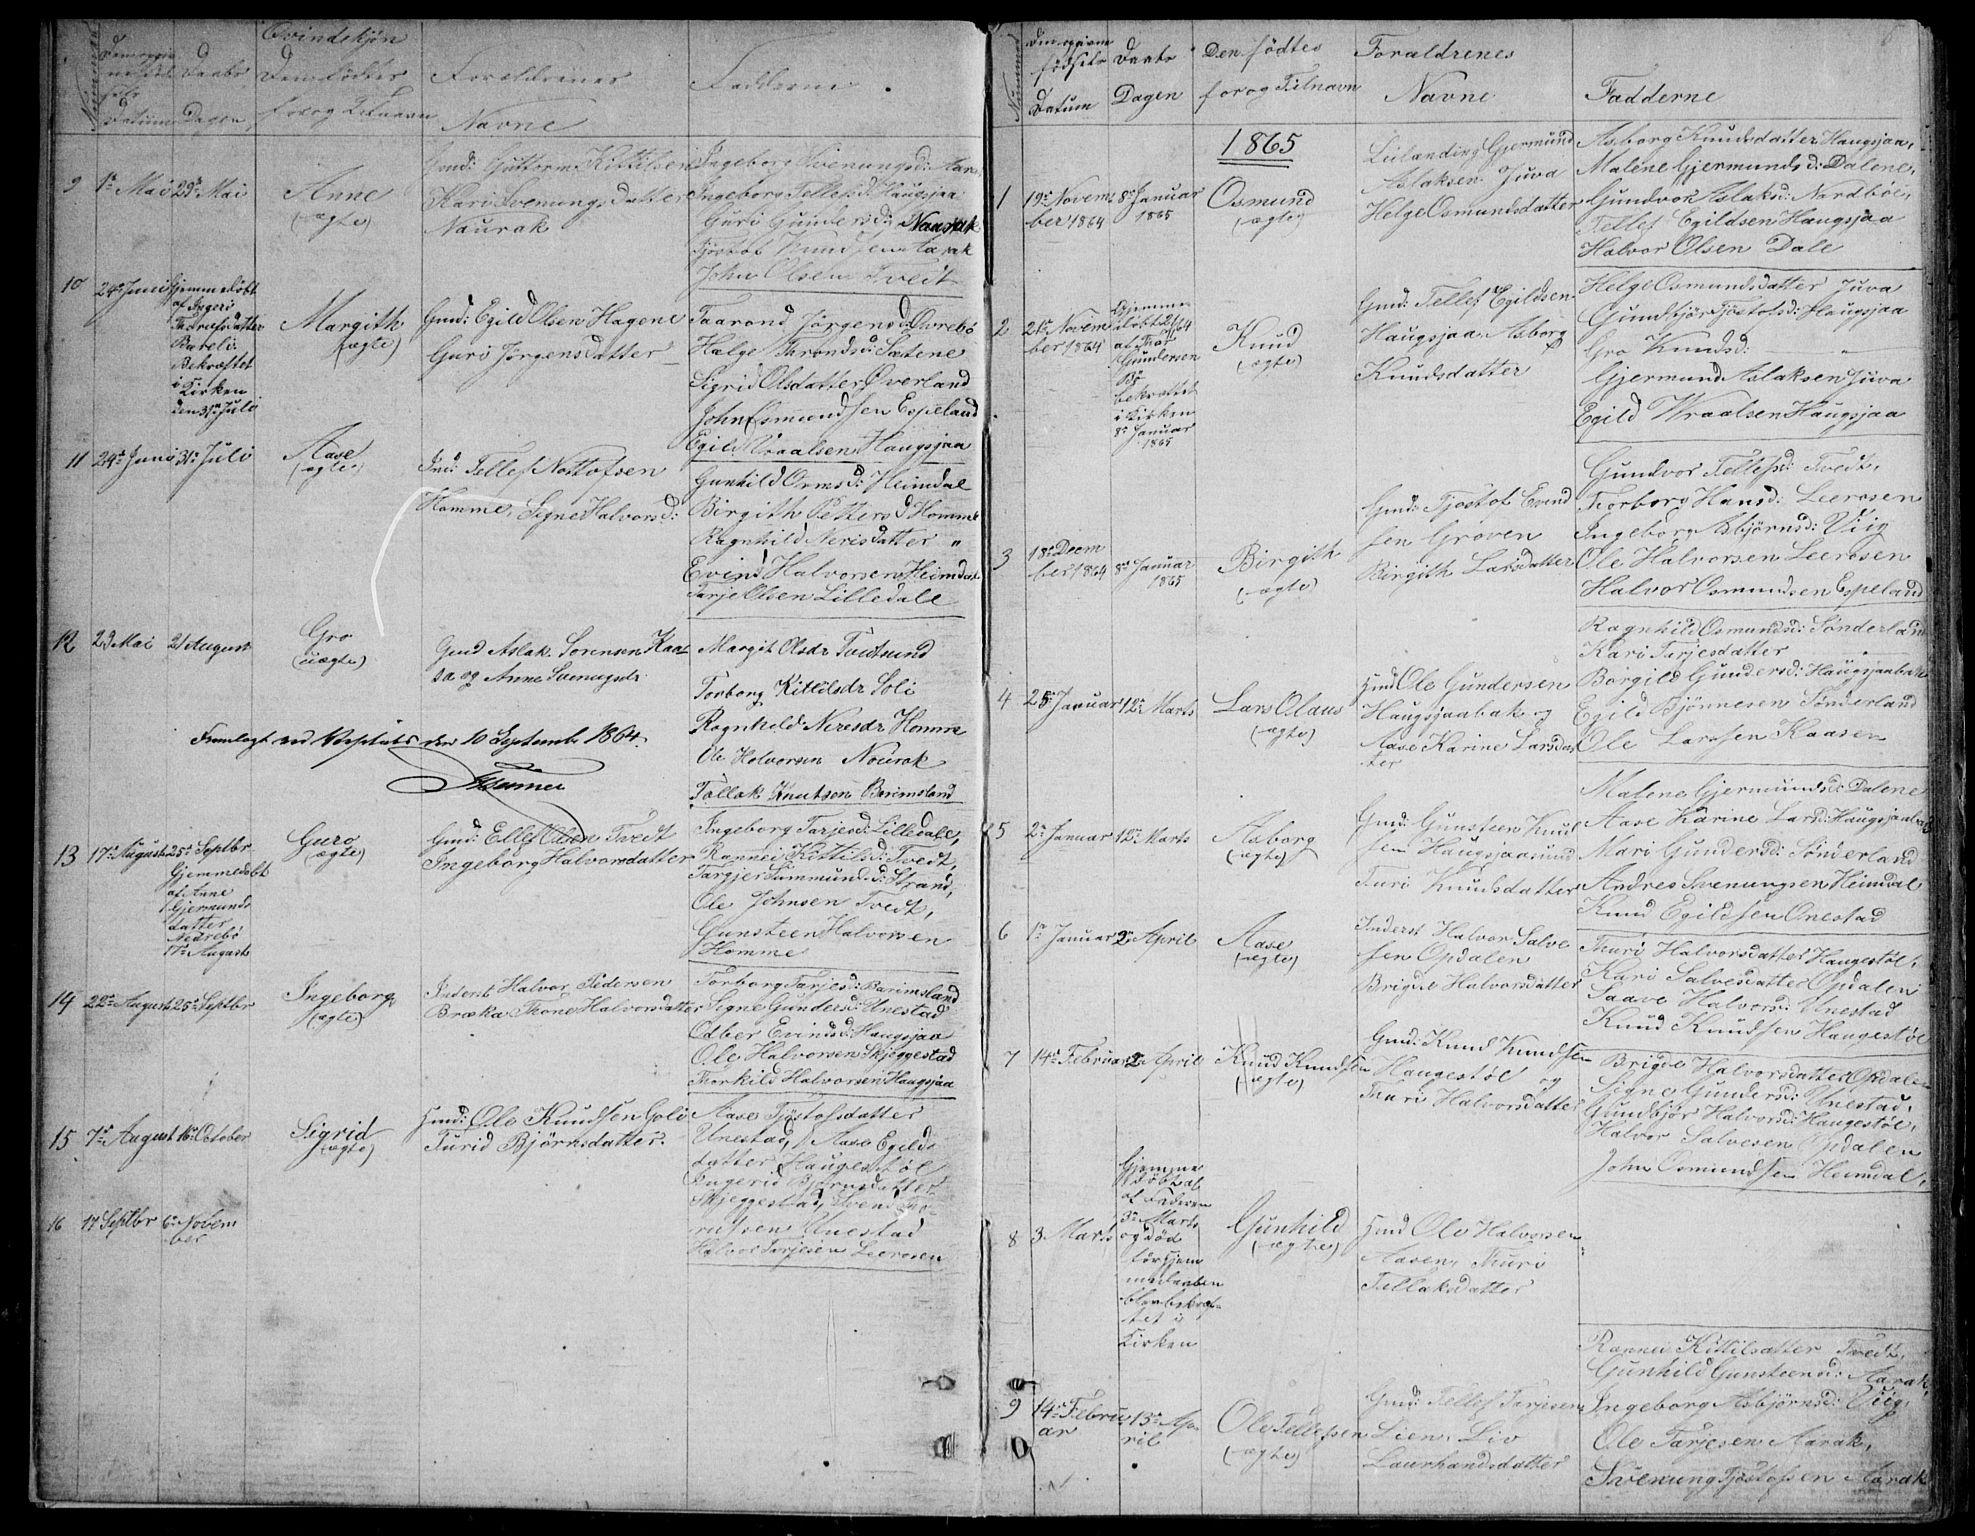 SAKO, Nissedal kirkebøker, G/Gb/L0002: Klokkerbok nr. II 2, 1863-1892, s. 5